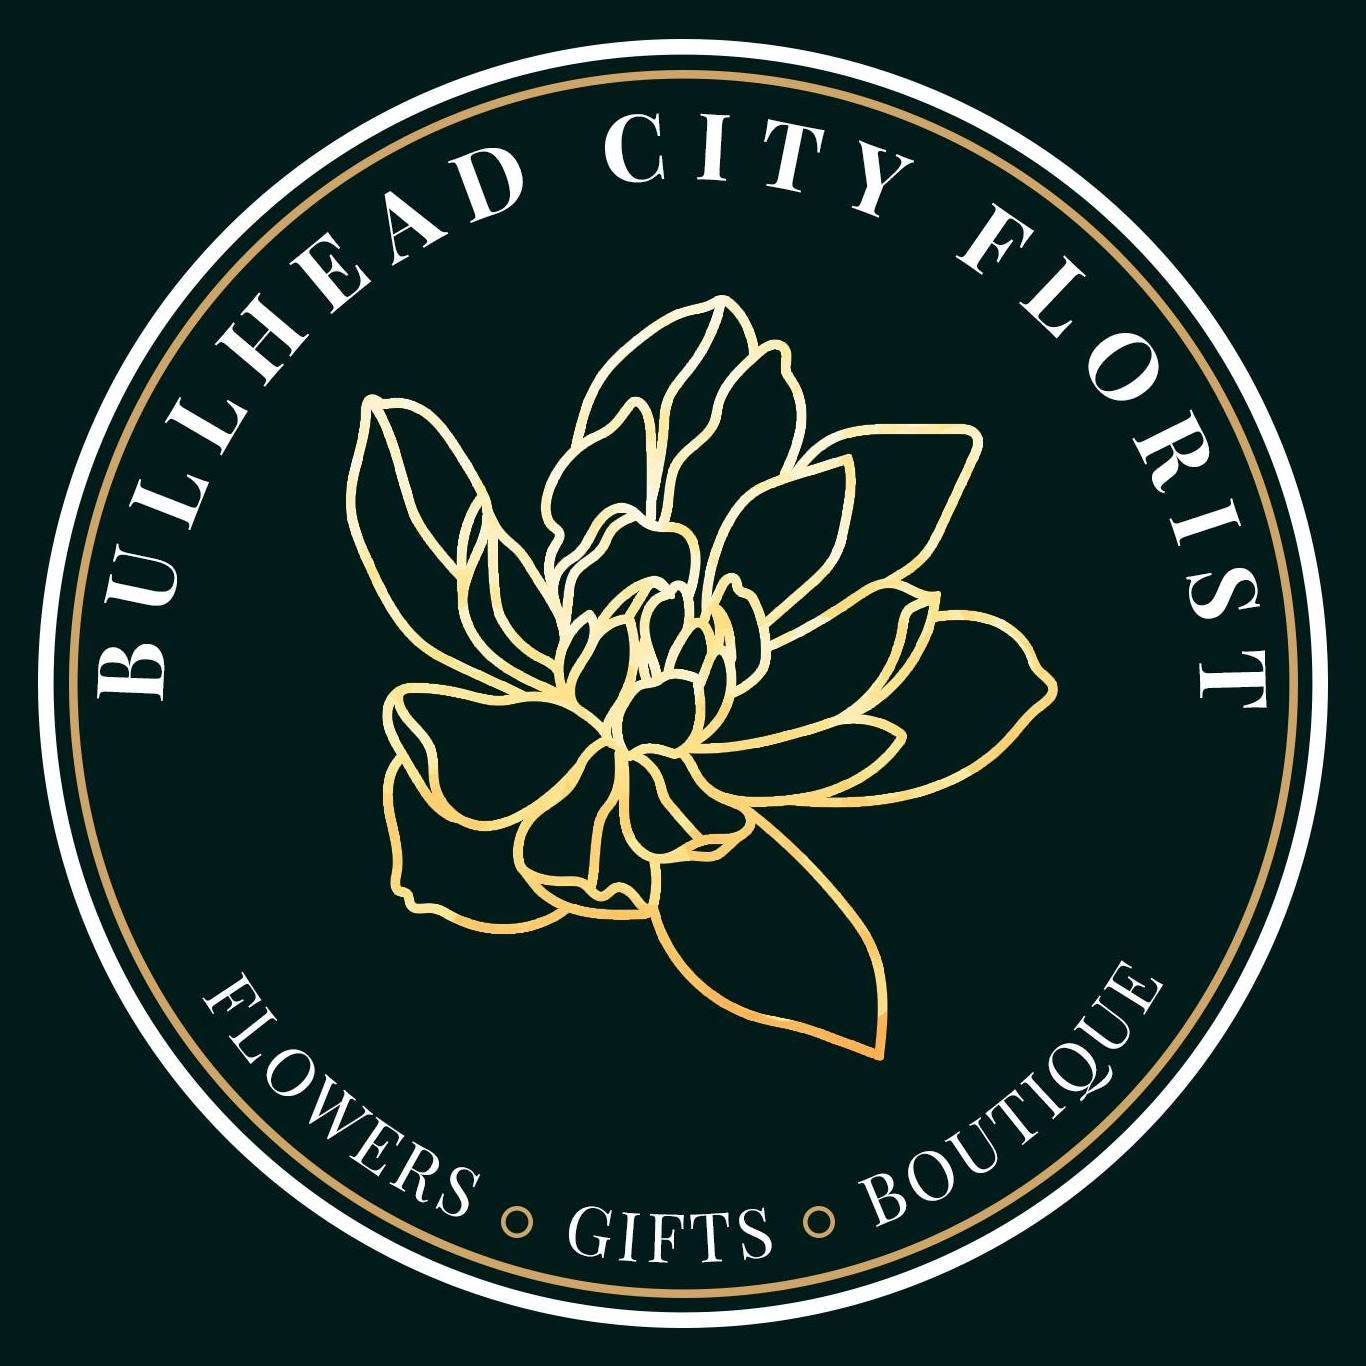 Bullhead City Florist logo